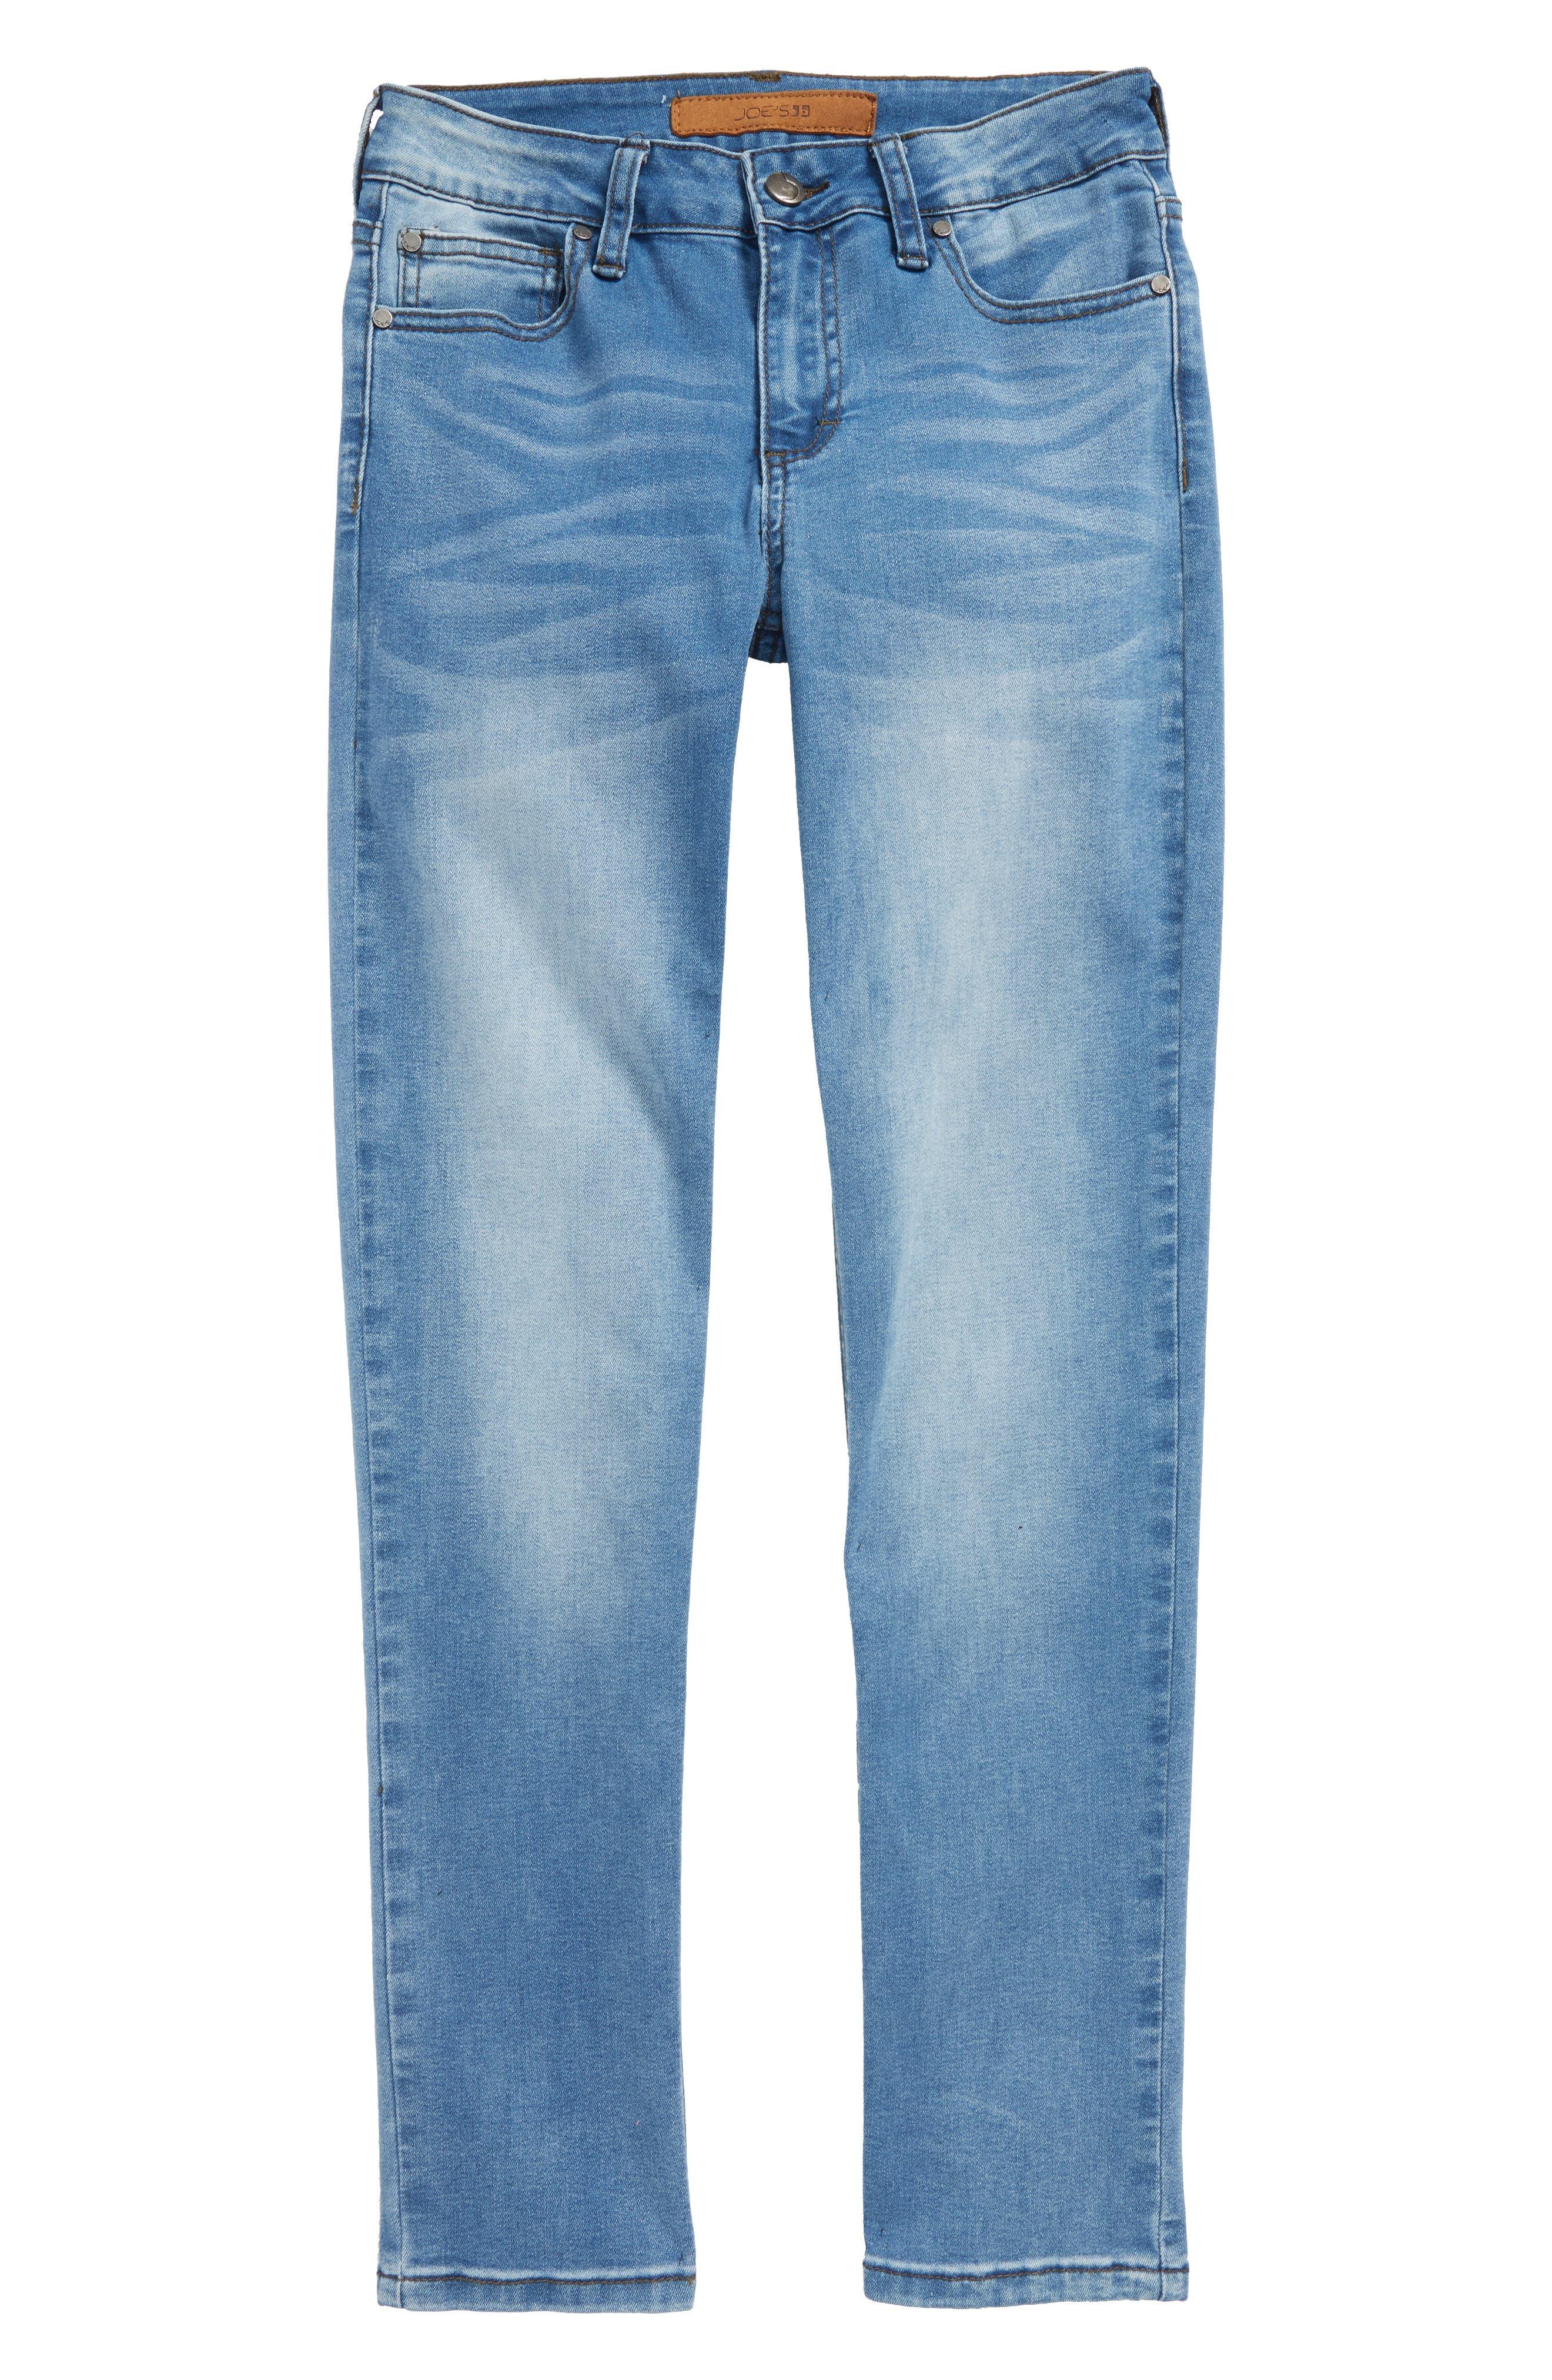 Rad Kinetic Stretch Skinny Fit Jeans,                         Main,                         color, Cubana Blue